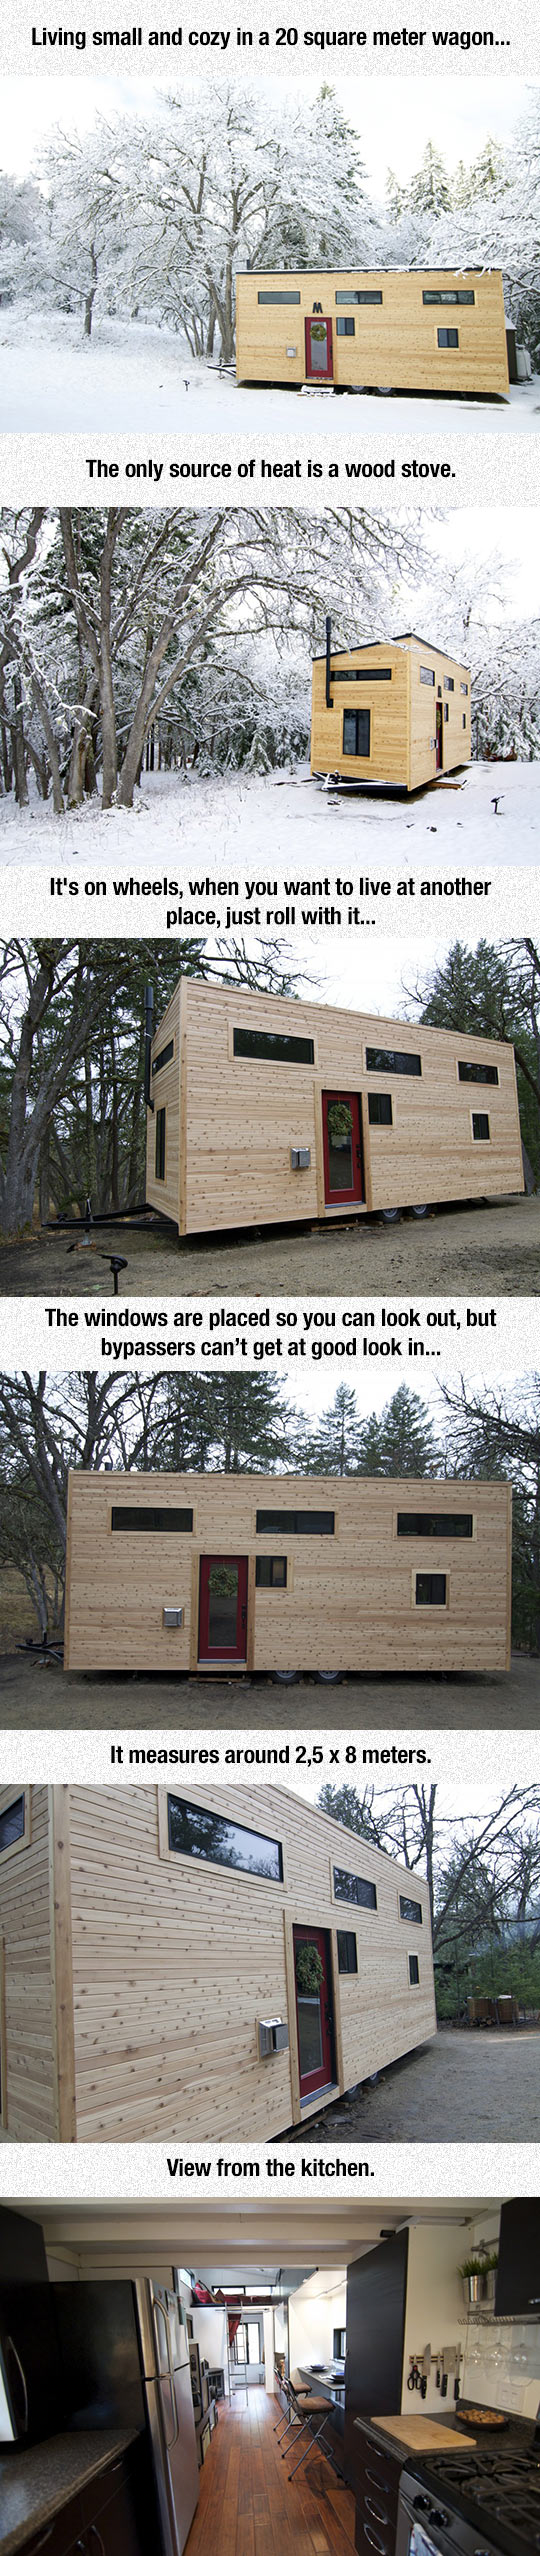 cool-small-cozy-wagon-home